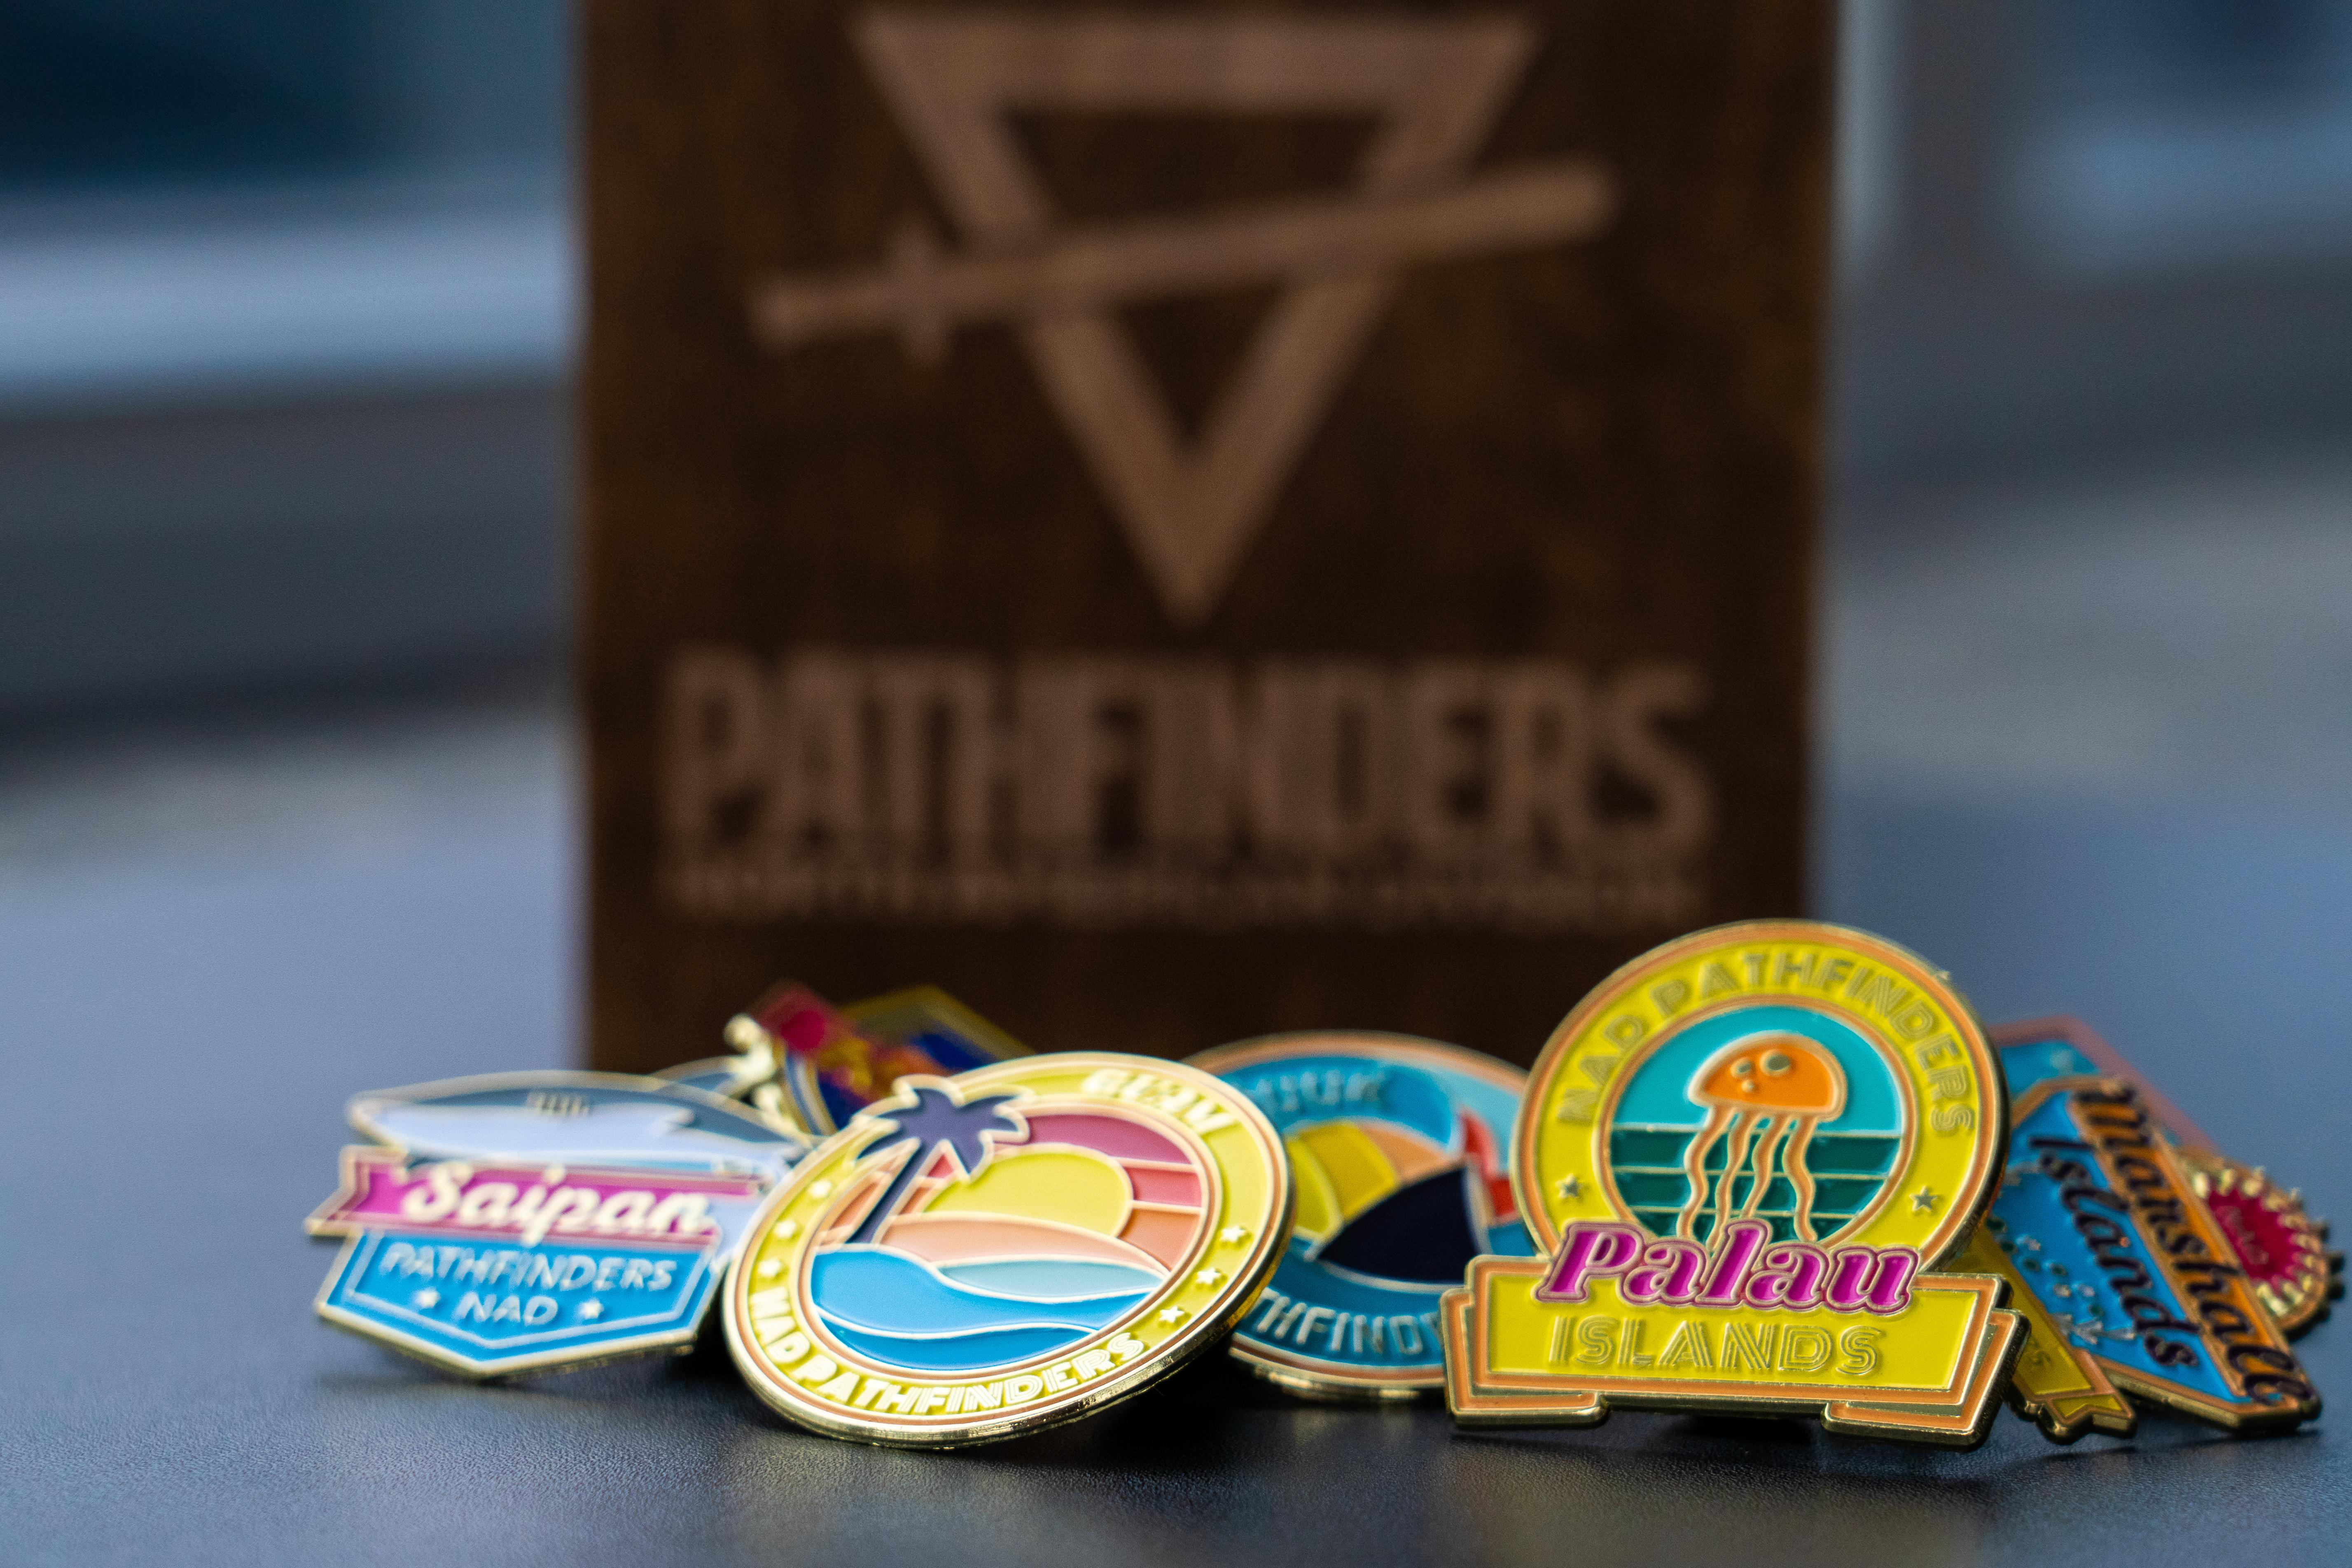 Oshkosh CHOSEN 2019 Pathfinder International Camporee David spinner Pin